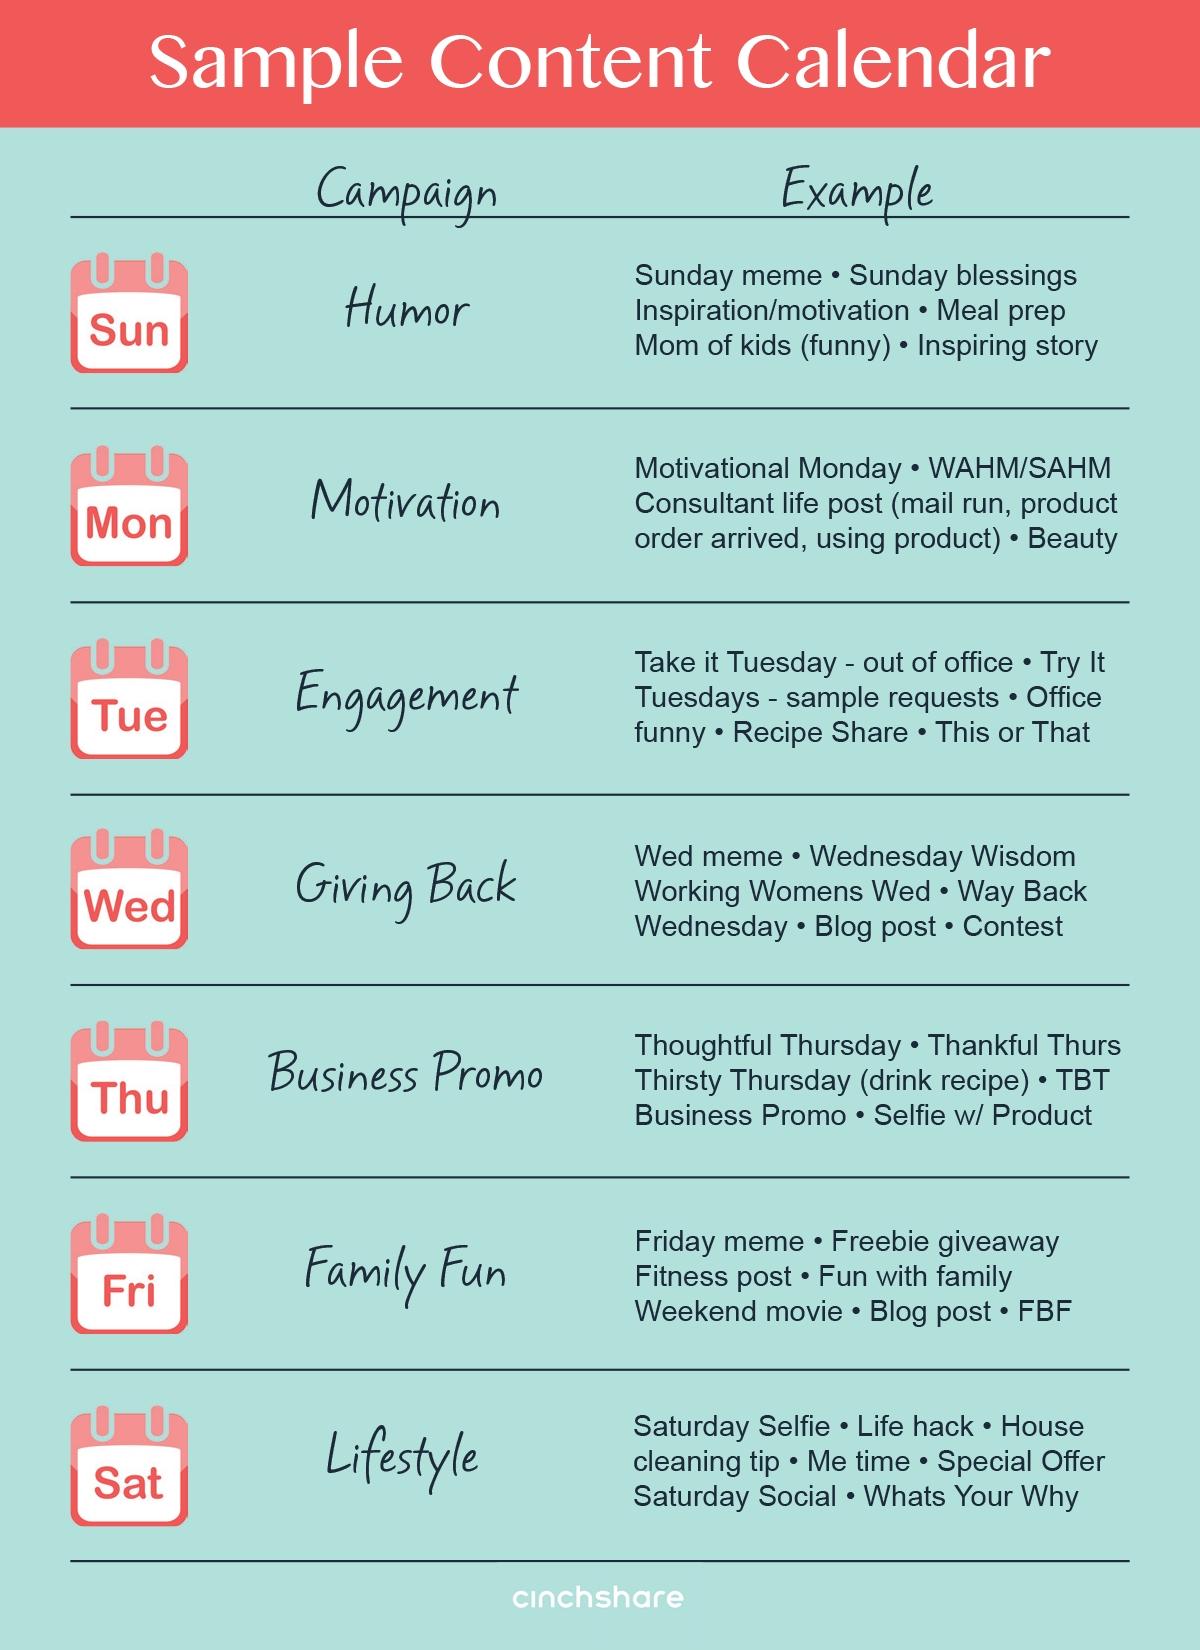 Image Result For Social Media Campaign Examples | Classy Hippie Tea for Social Media Content Calendar Examples